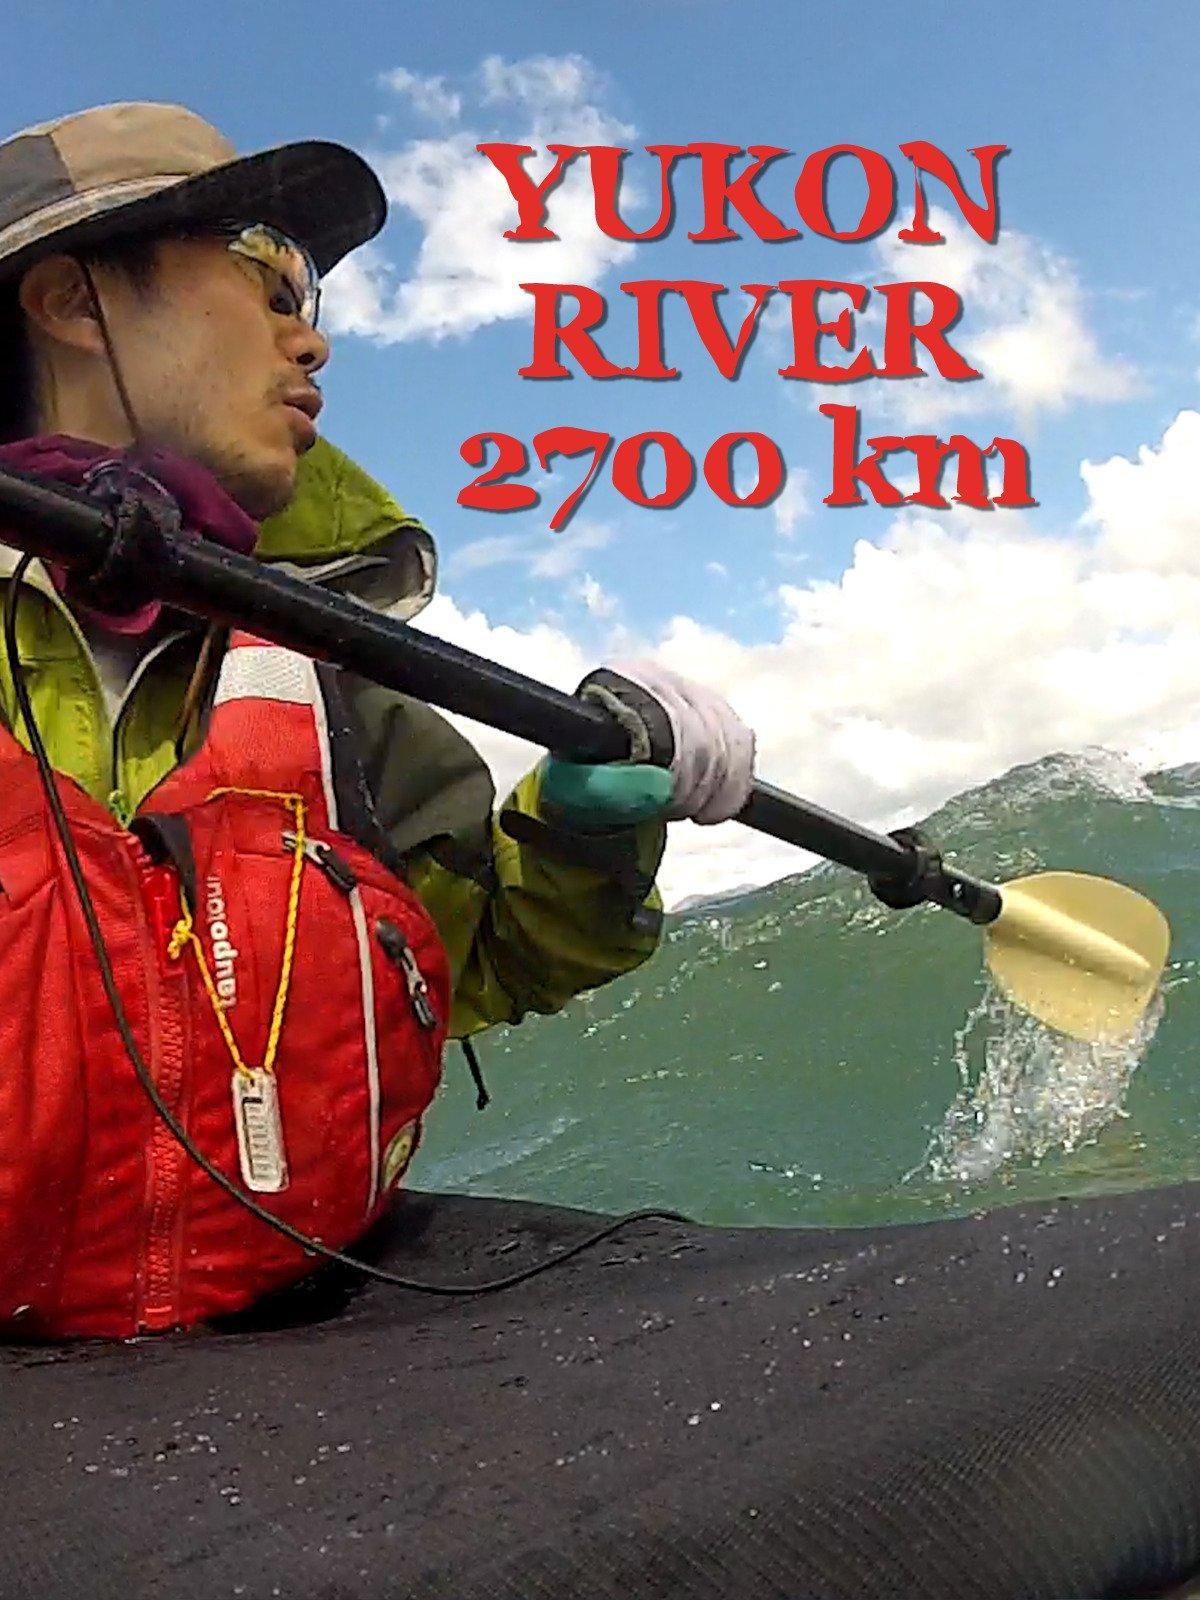 Yukon River 2700 km on Amazon Prime Instant Video UK